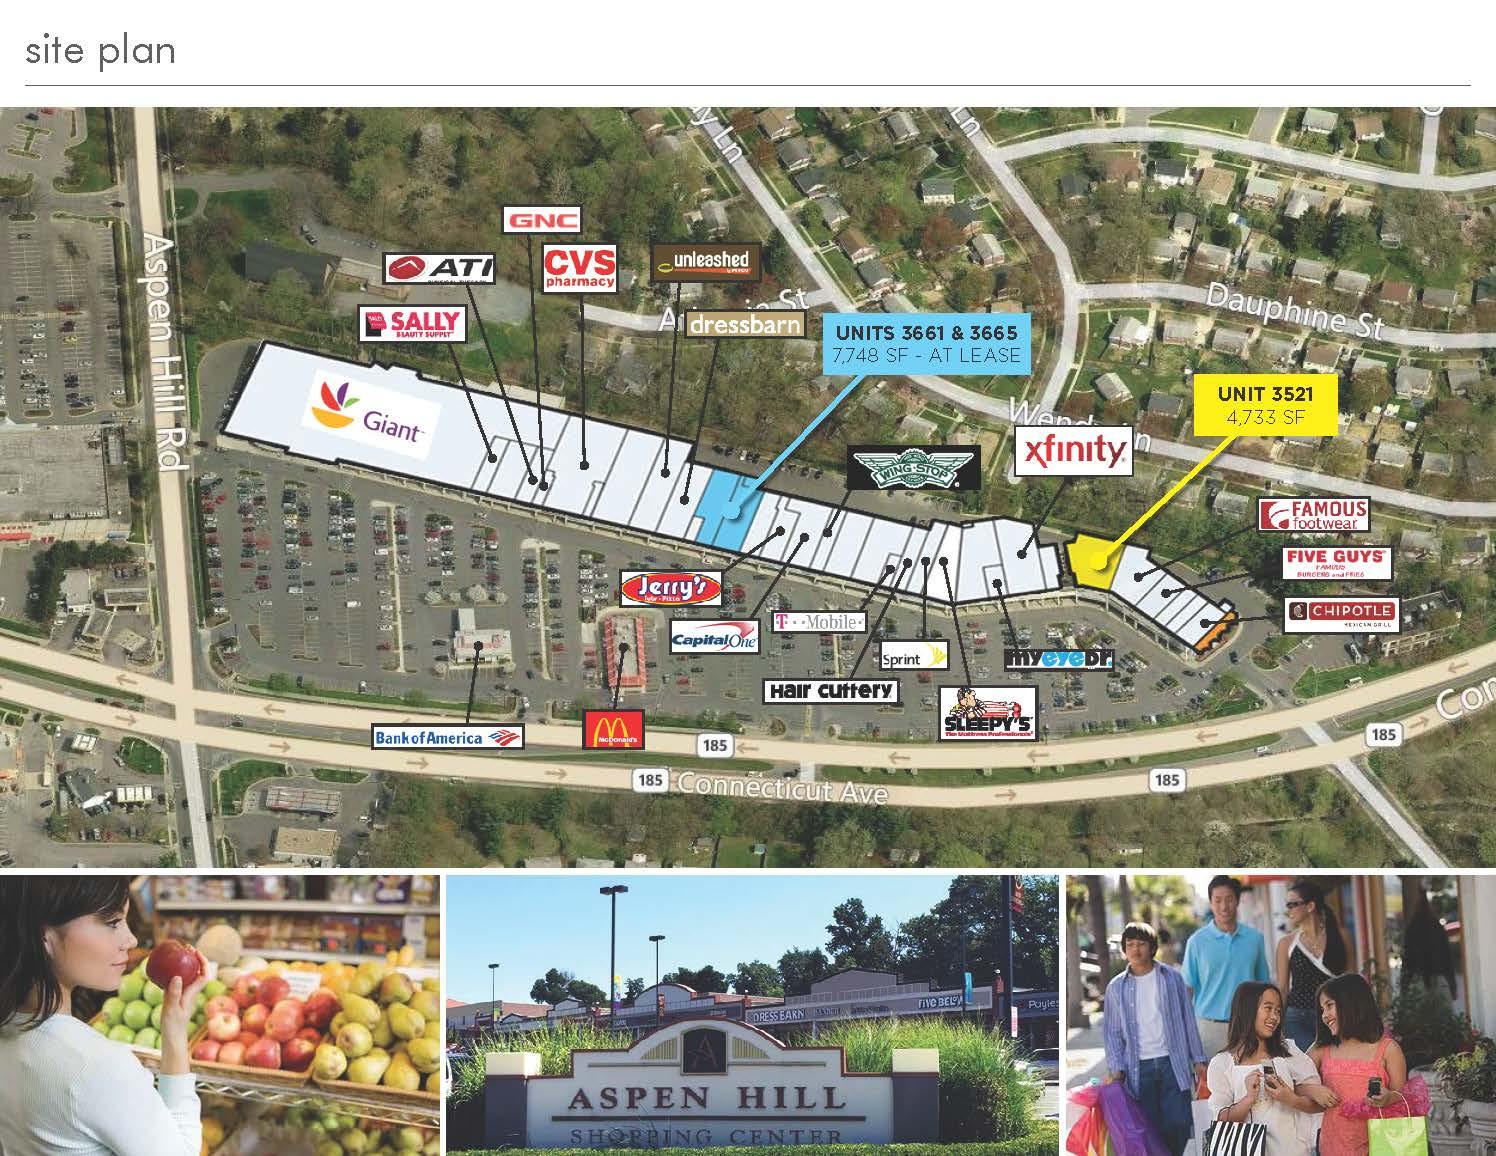 Aspen Hill SC Site Plan Streetsense Brokerage